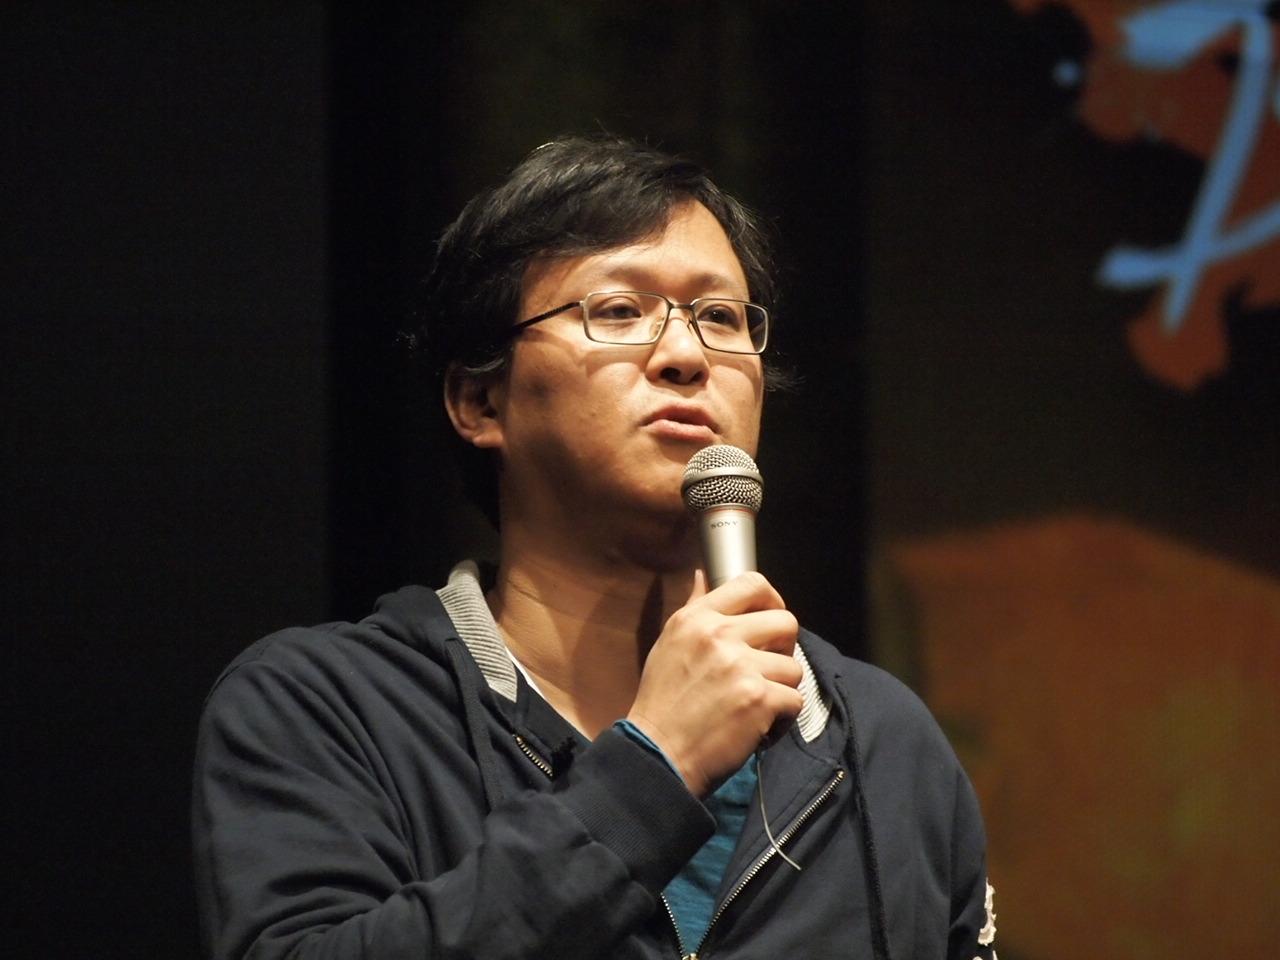 NCSOFT Chief Producing Officer兼ブレイドアンドソウル総括プロデューサー ベ・ジェヒョン氏